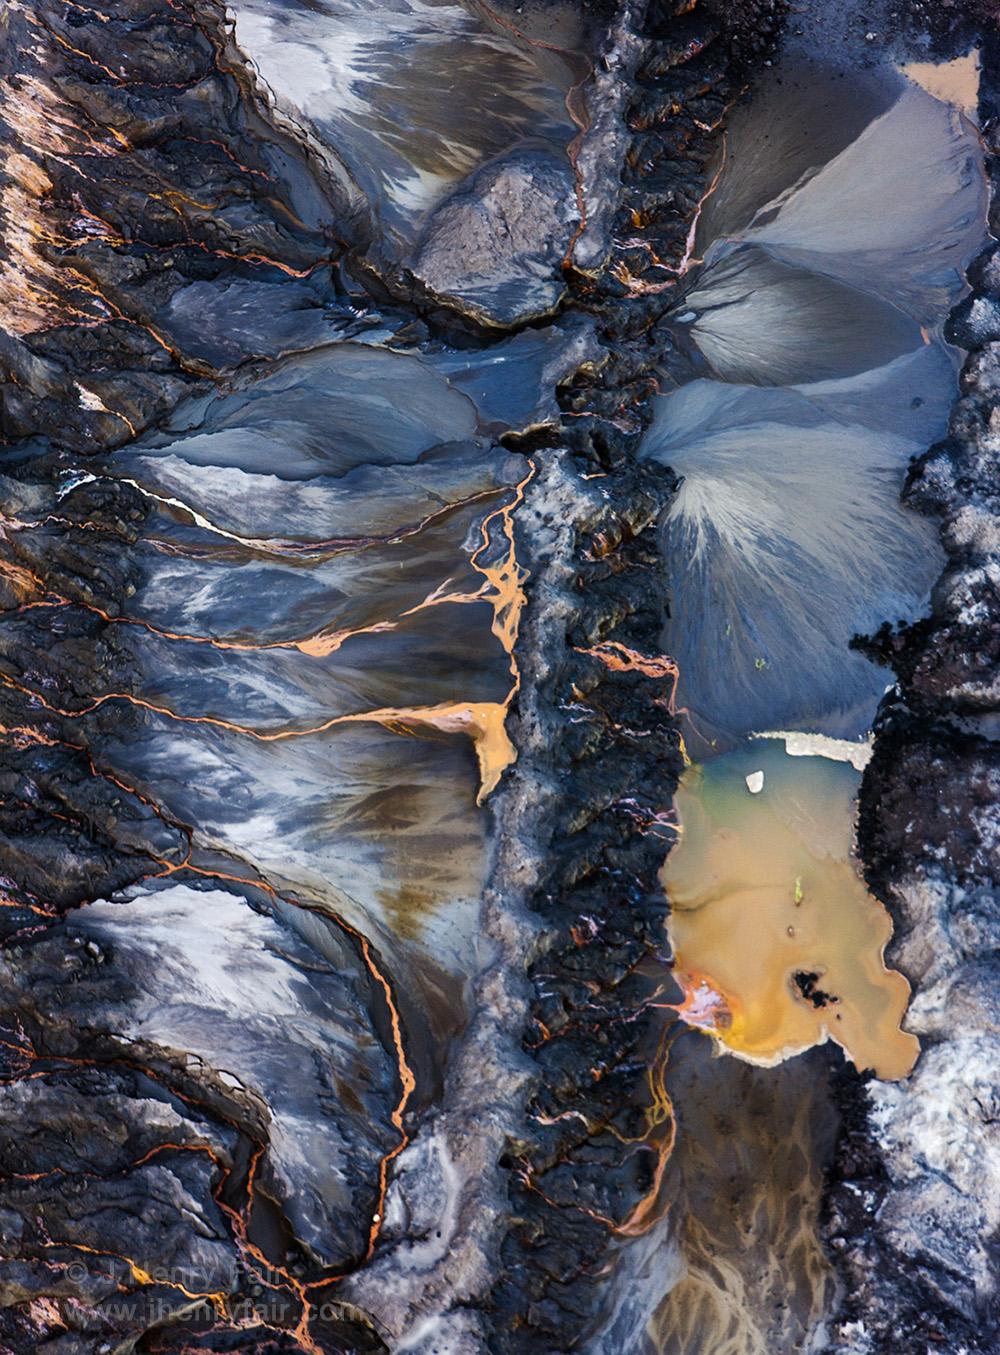 Leachate from coal mines